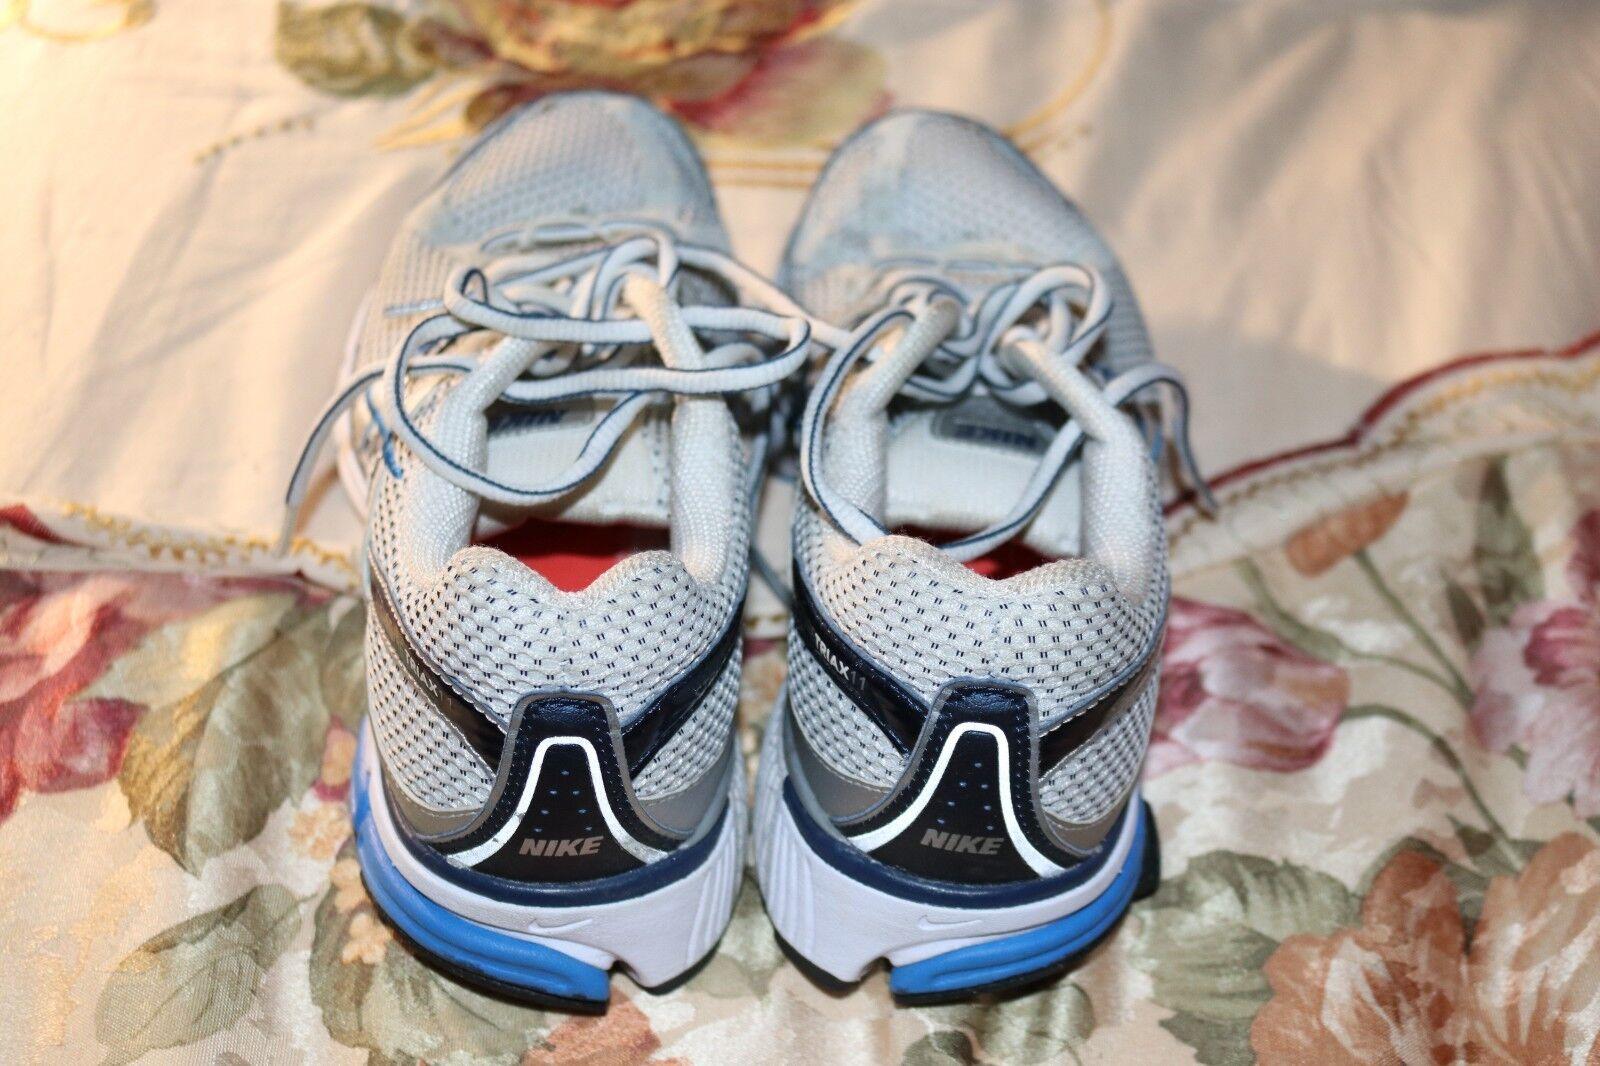 nike zoom zoom zoom struttura triax 11 scarpe femminili (misura 8,5) | Menu elegante e robusto  | Scolaro/Ragazze Scarpa  ebed7e